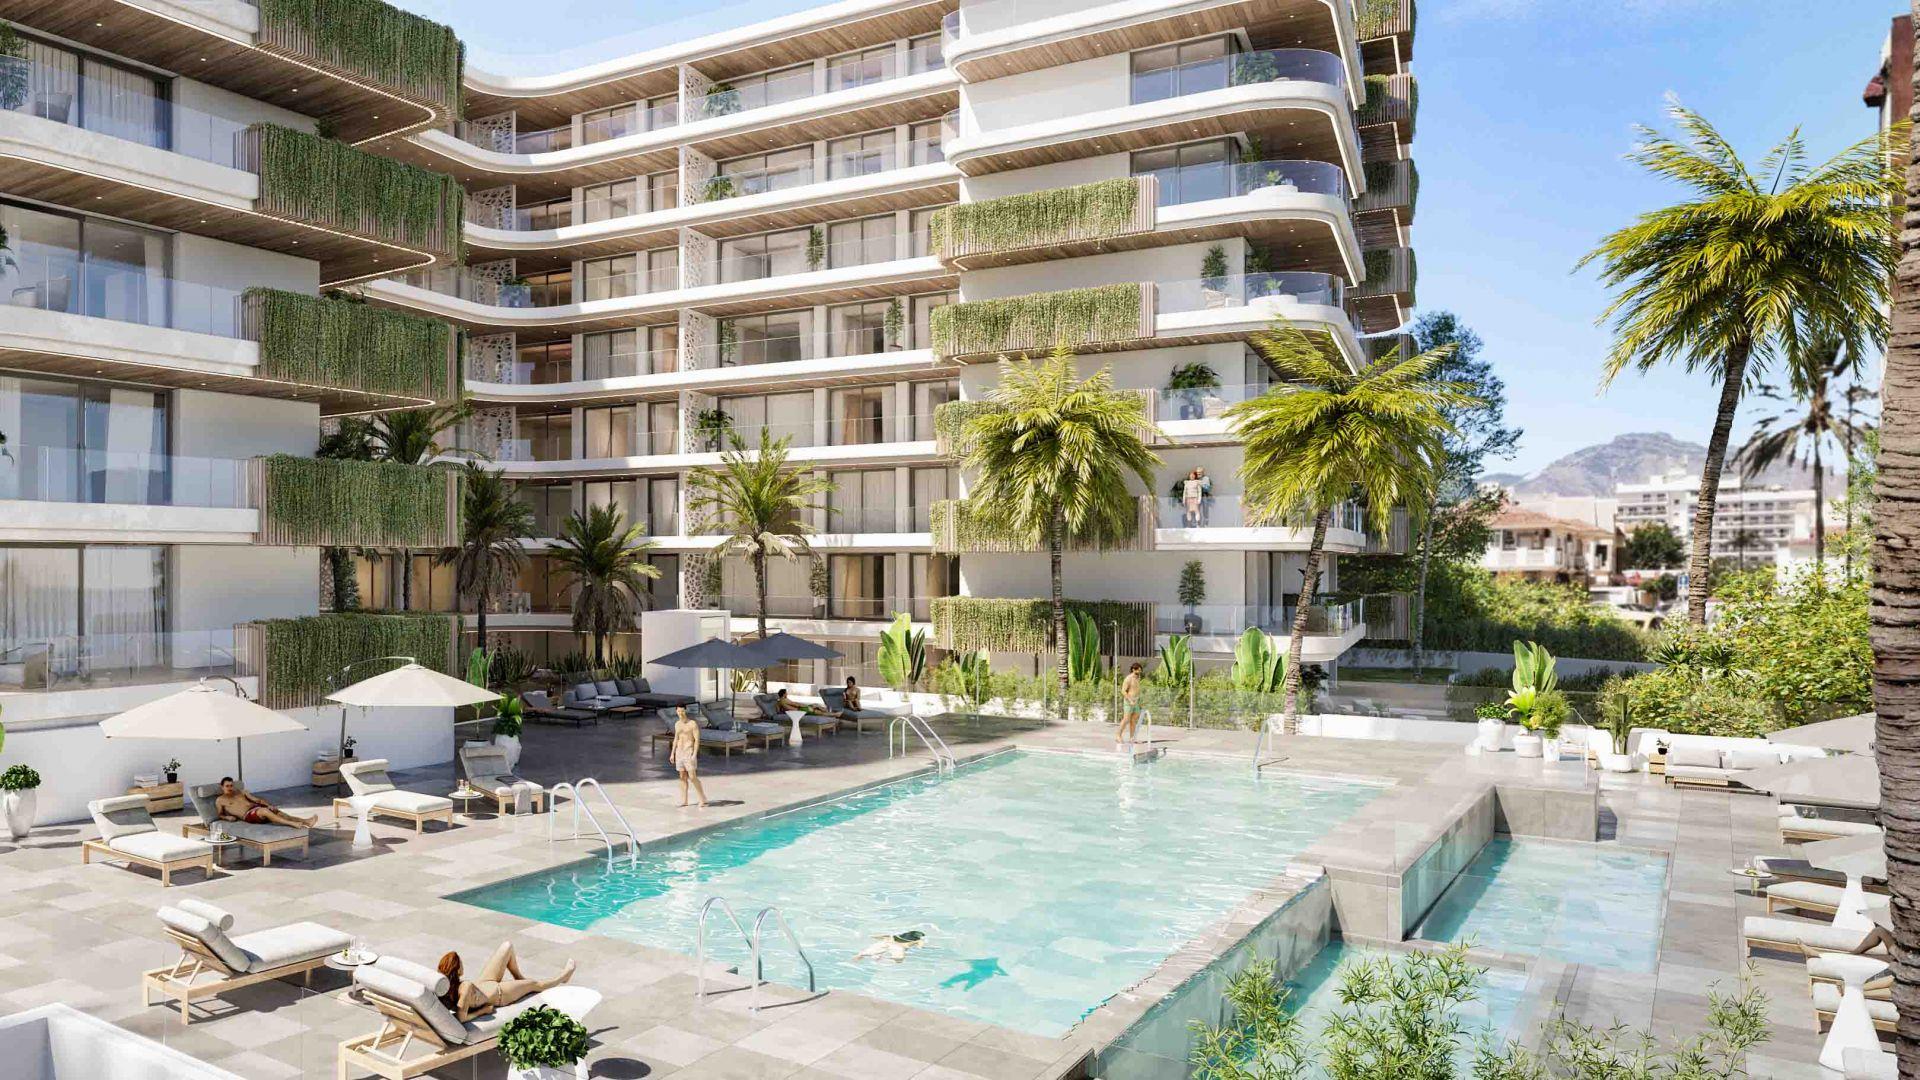 Apartment at Jade Tower, Fuengirola | Christie's International Real Estate